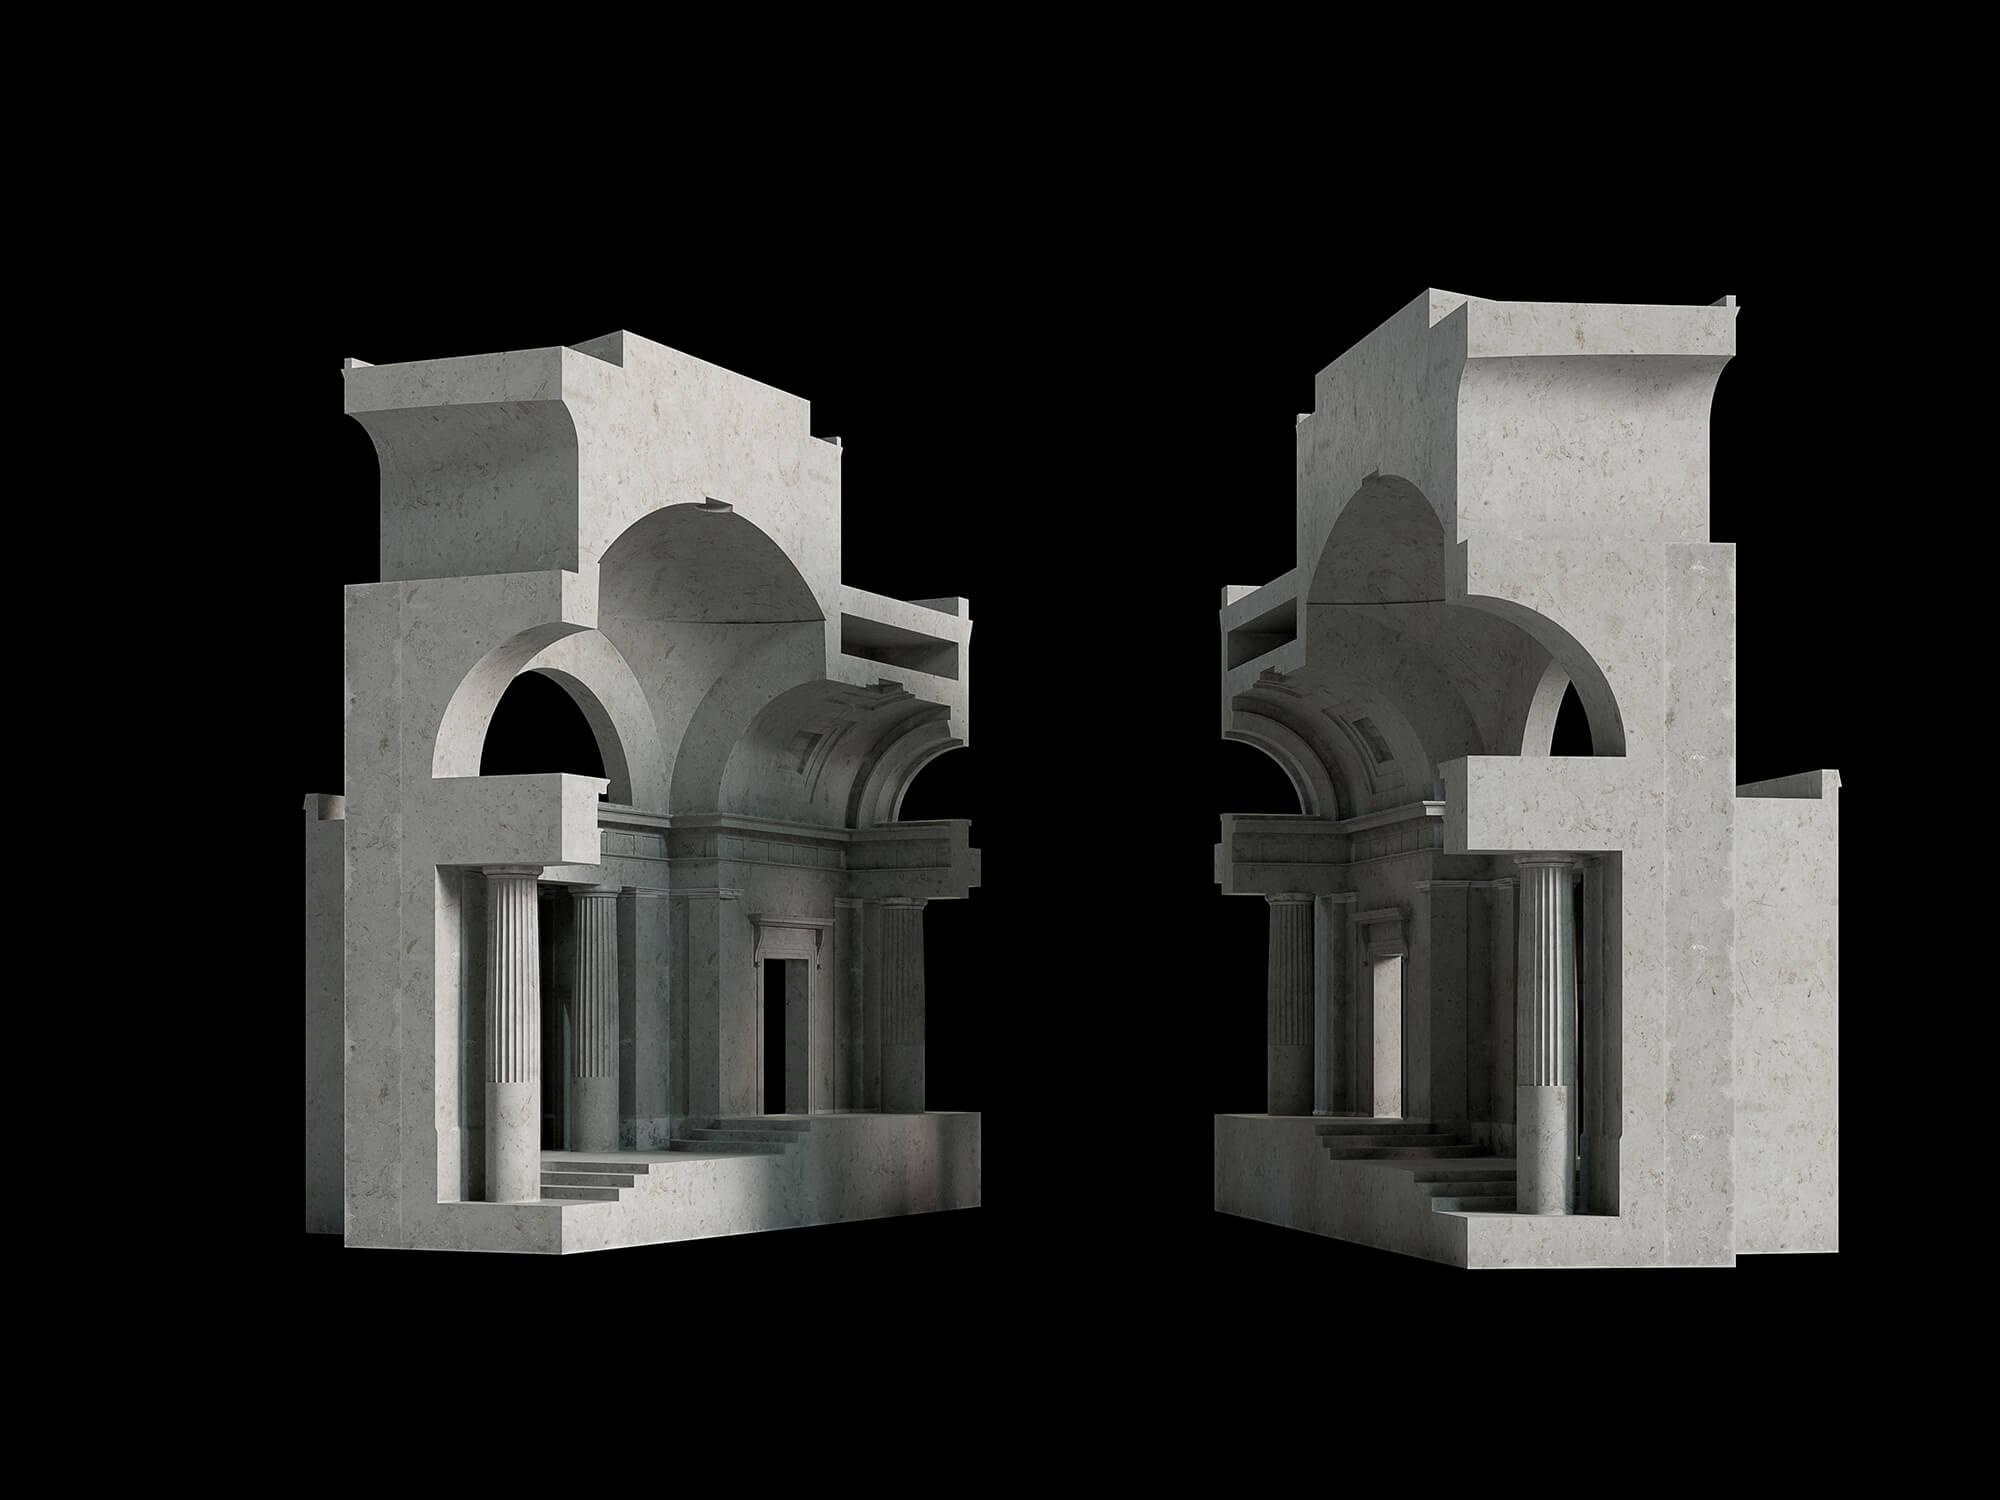 WHITE CROW STUDIOS - SIR JOHN SOANE MUSEUM - PRODUCT CGI